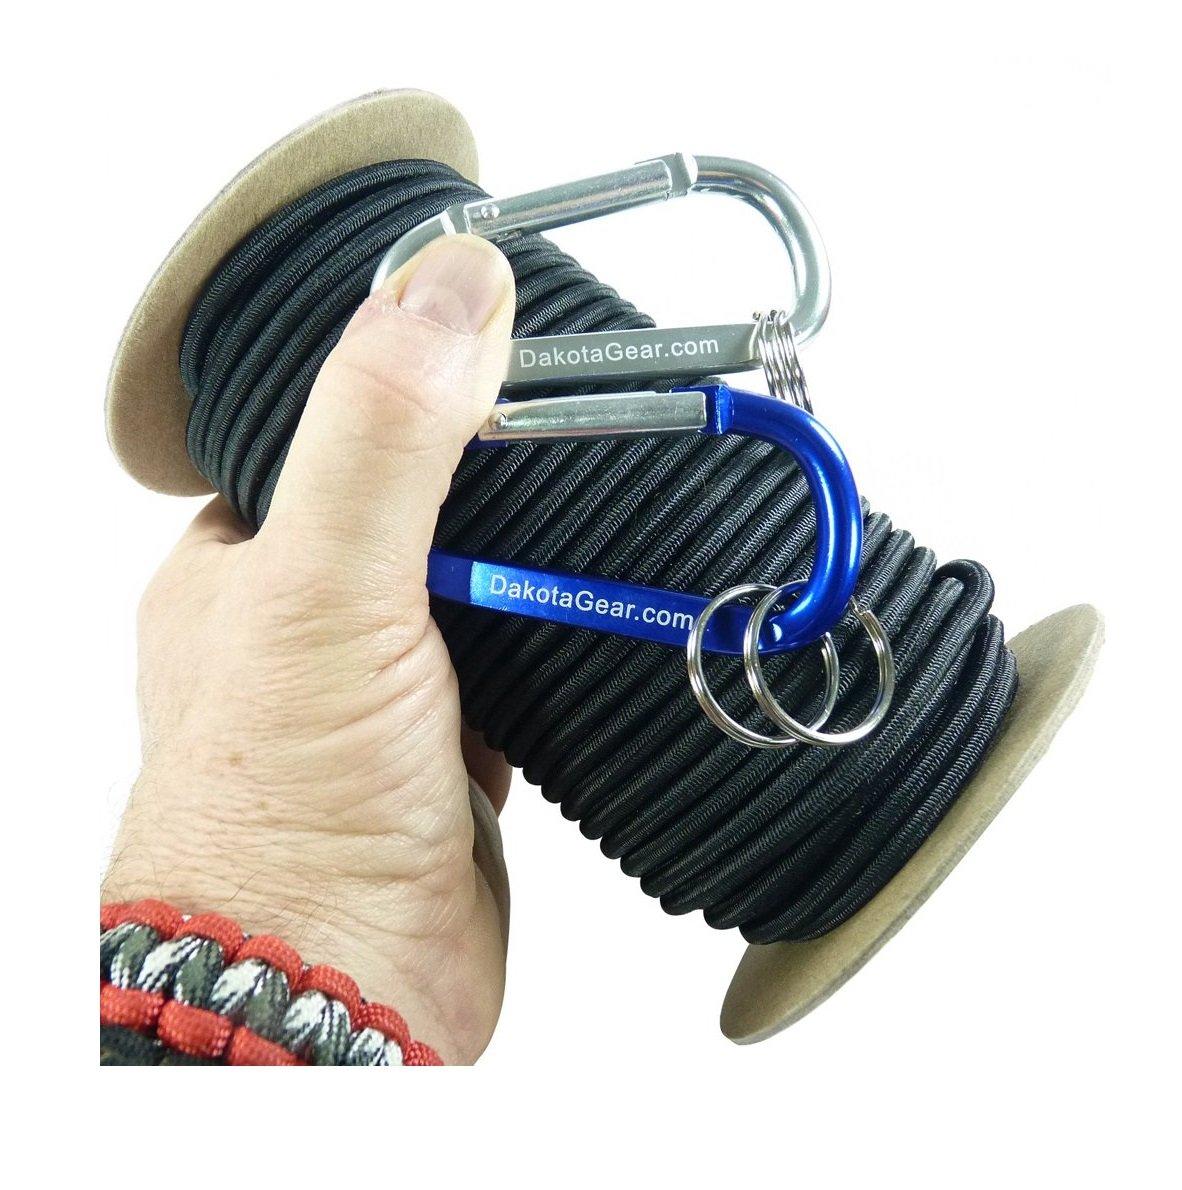 Dakota Gear (TM) Shock Cord - COSMIC BLACK - 3/16'' x 80 ft. Spool. Marine Grade. Also called Bungee Cord, Stretch Cord & Elastic Cord. Made In USA. 2 Carabiners and Knot Tying eBook. by Dakota Gear (TM)